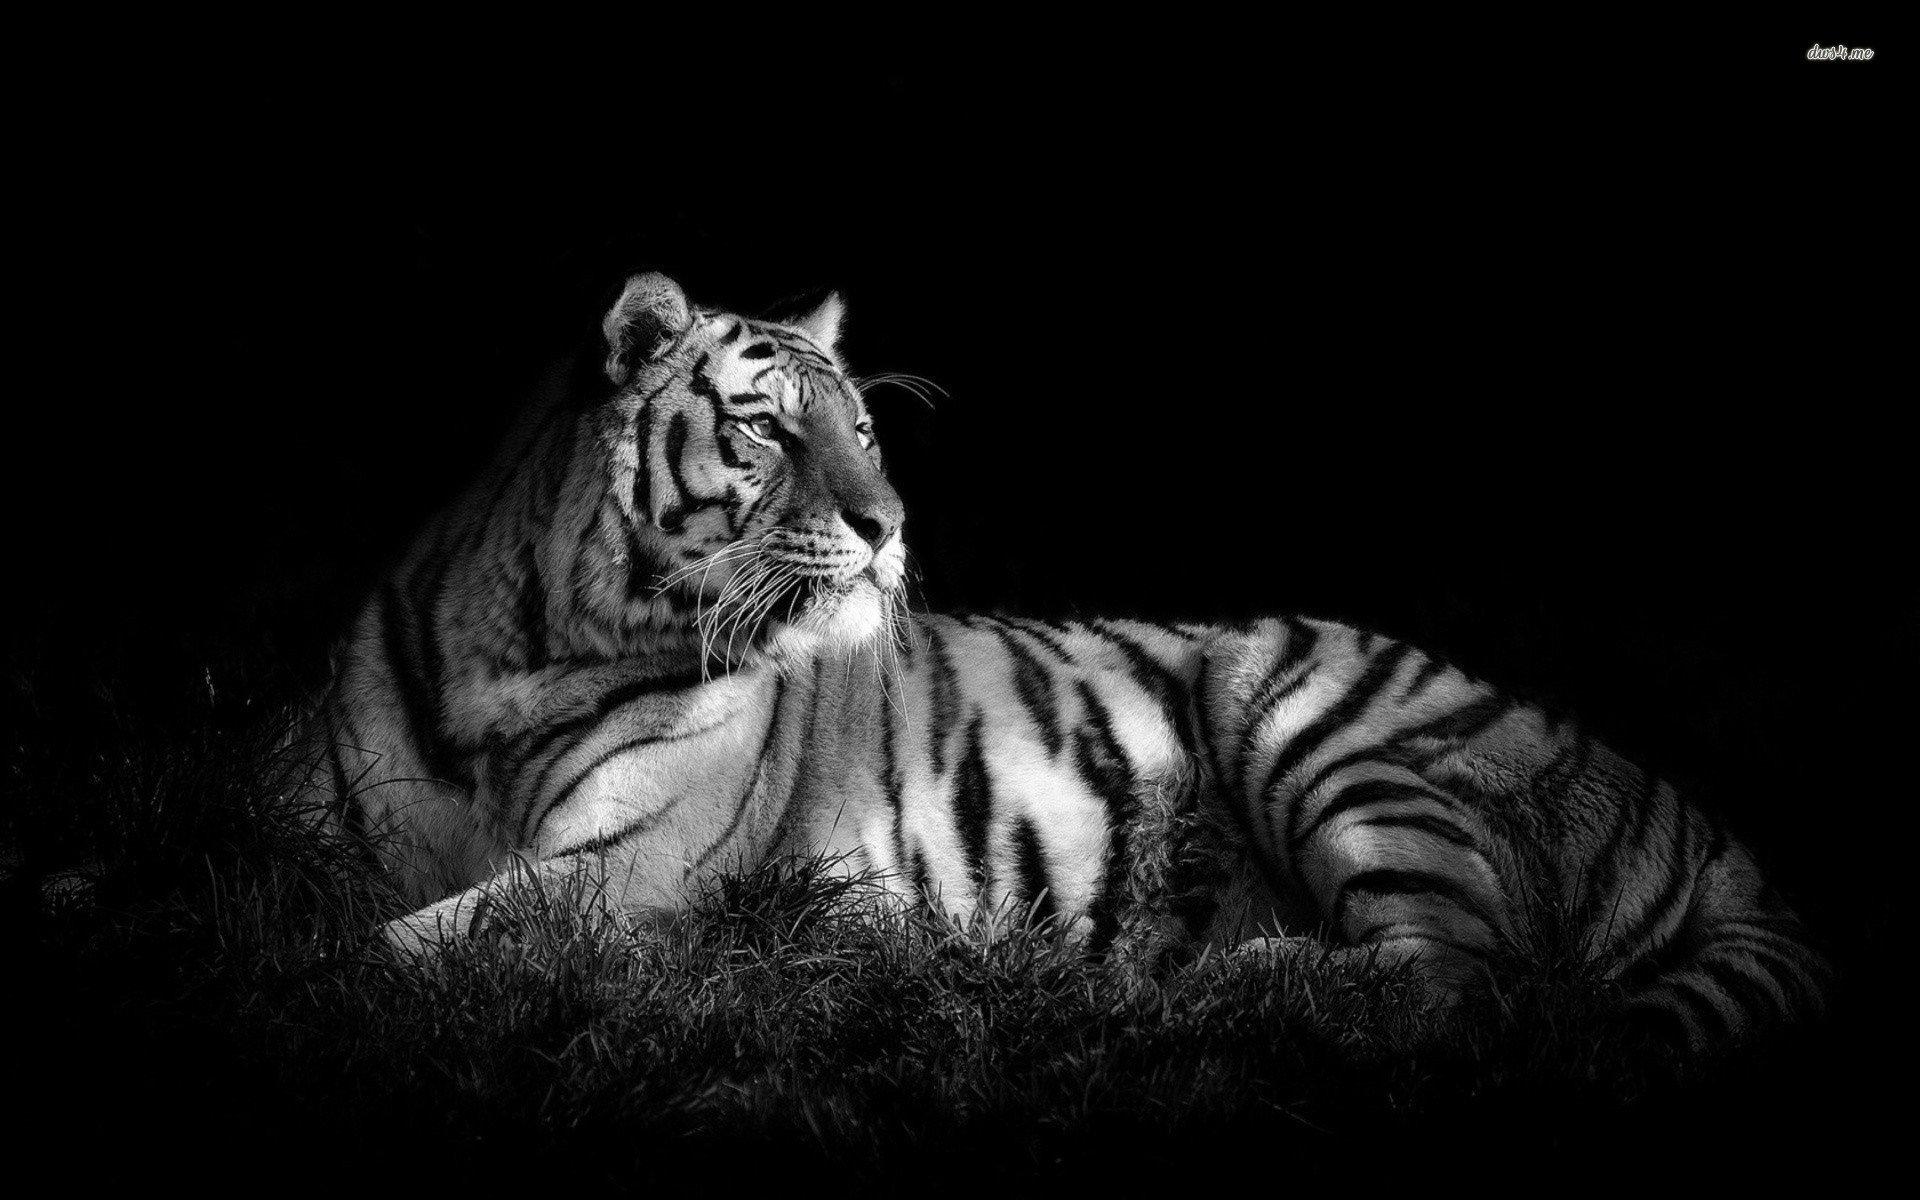 tiger wallpaper widescreen - photo #26